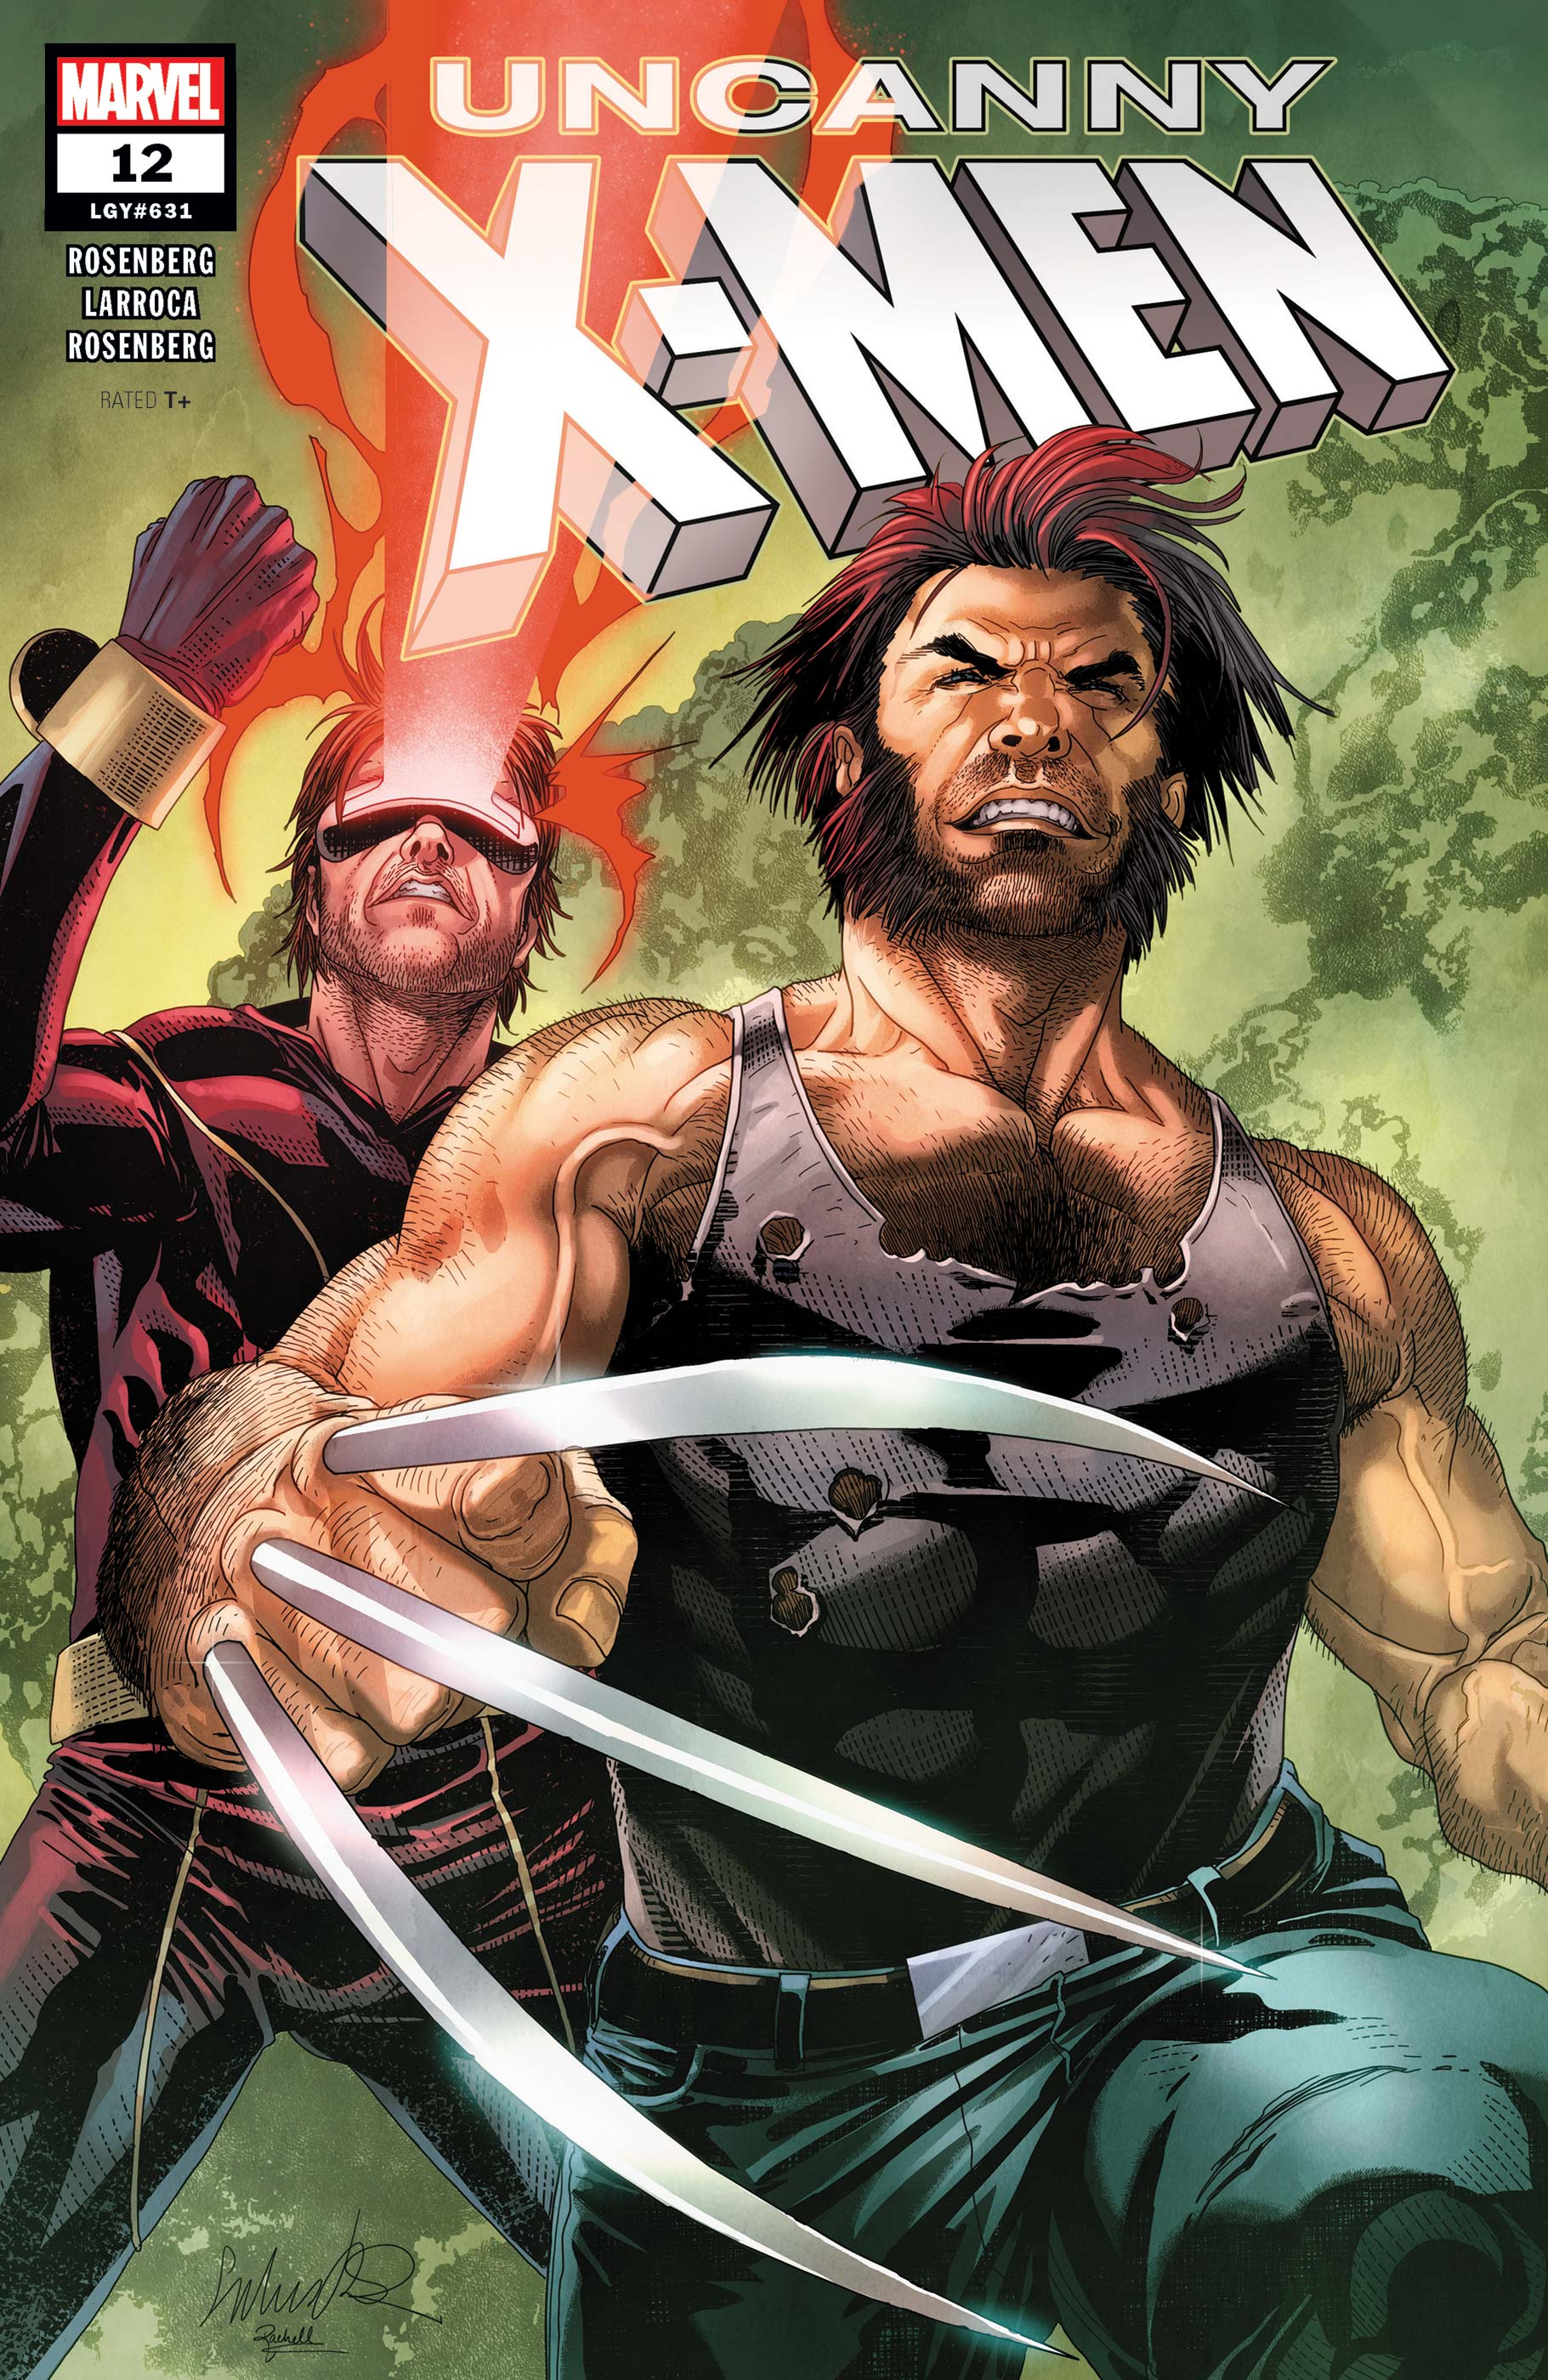 Uncanny X-Men (2018) #12